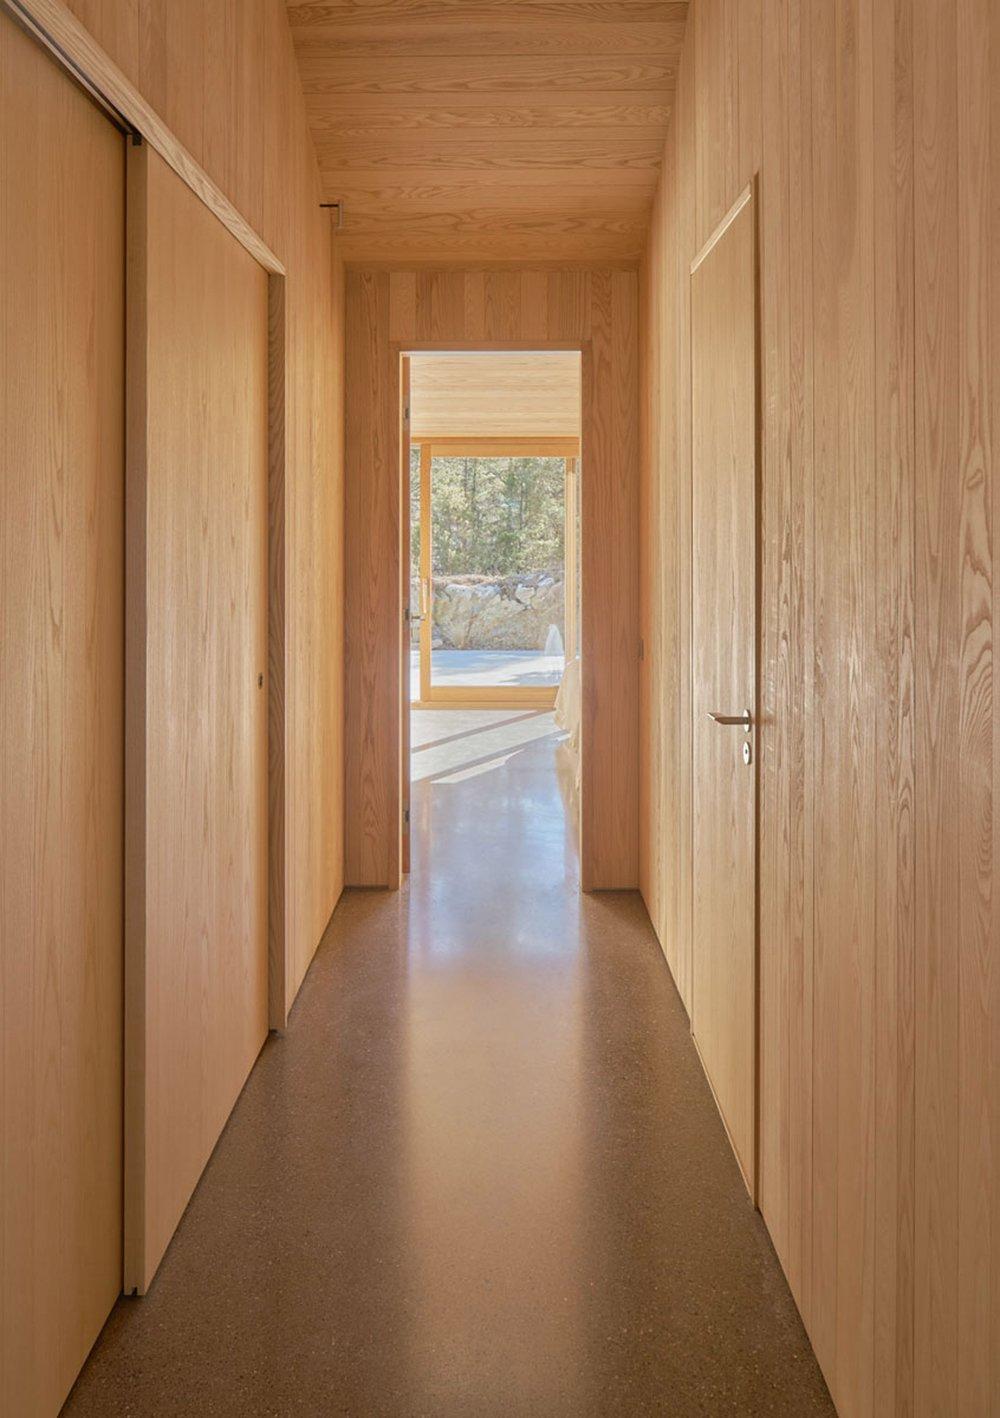 krokholmen-house-tham-videgard-architecture_dezeen_2364_col_9.jpg